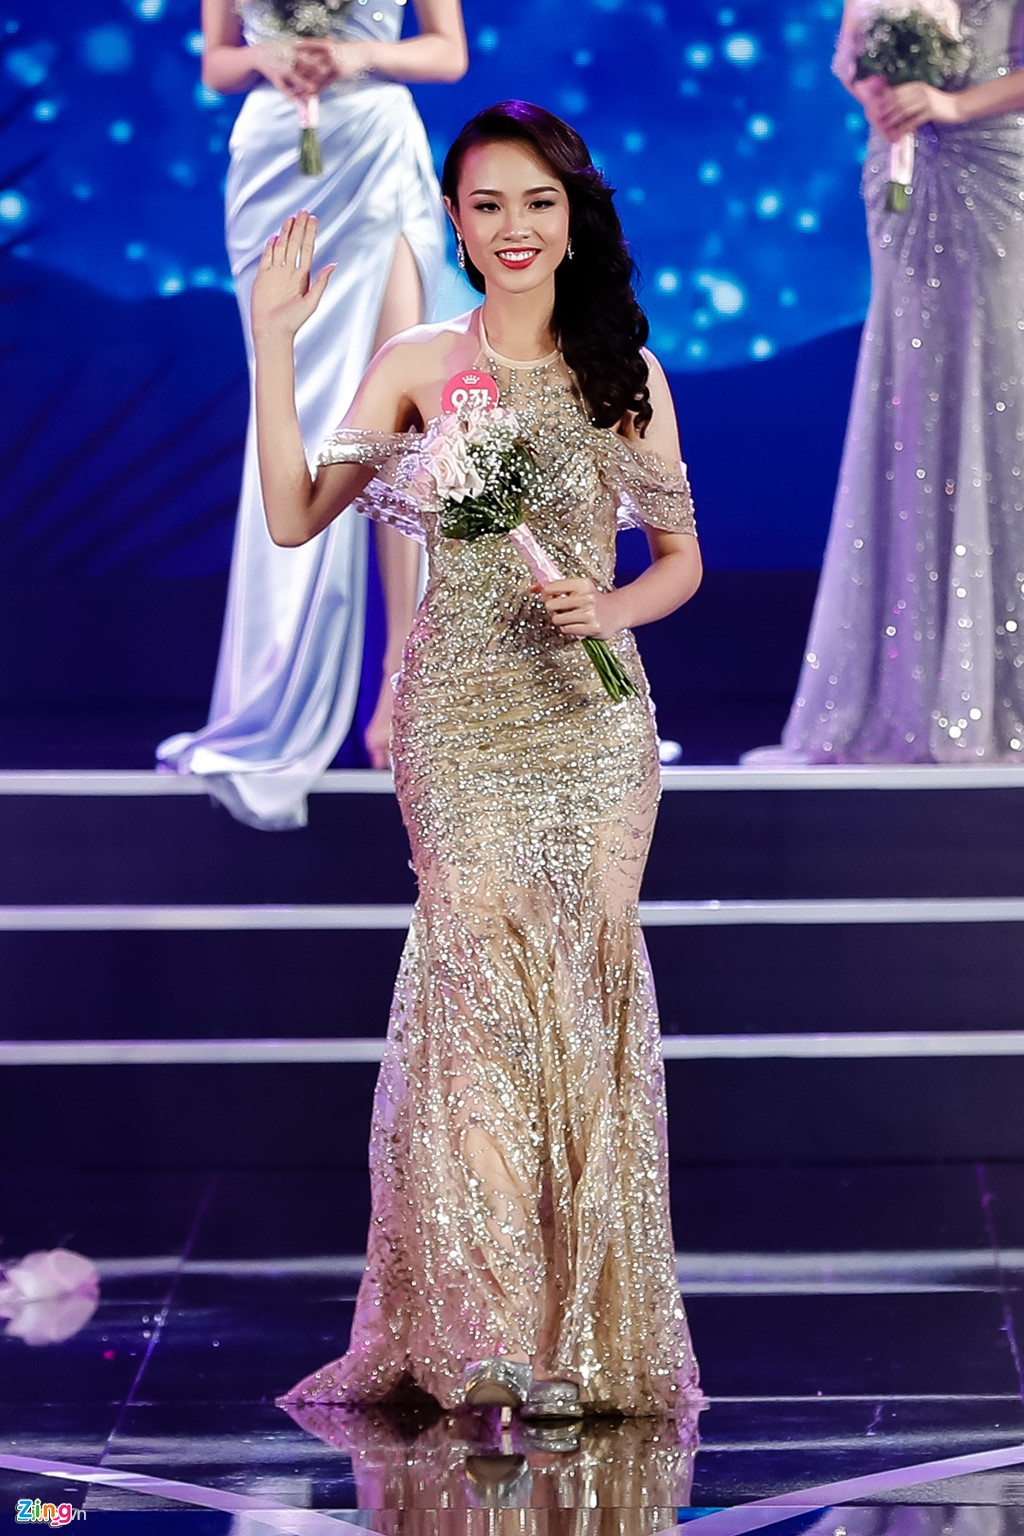 Hoa khoi DH Ngoai thuong tung nang 90 kg thi Hoa hau Viet Nam 2018 hinh anh 4